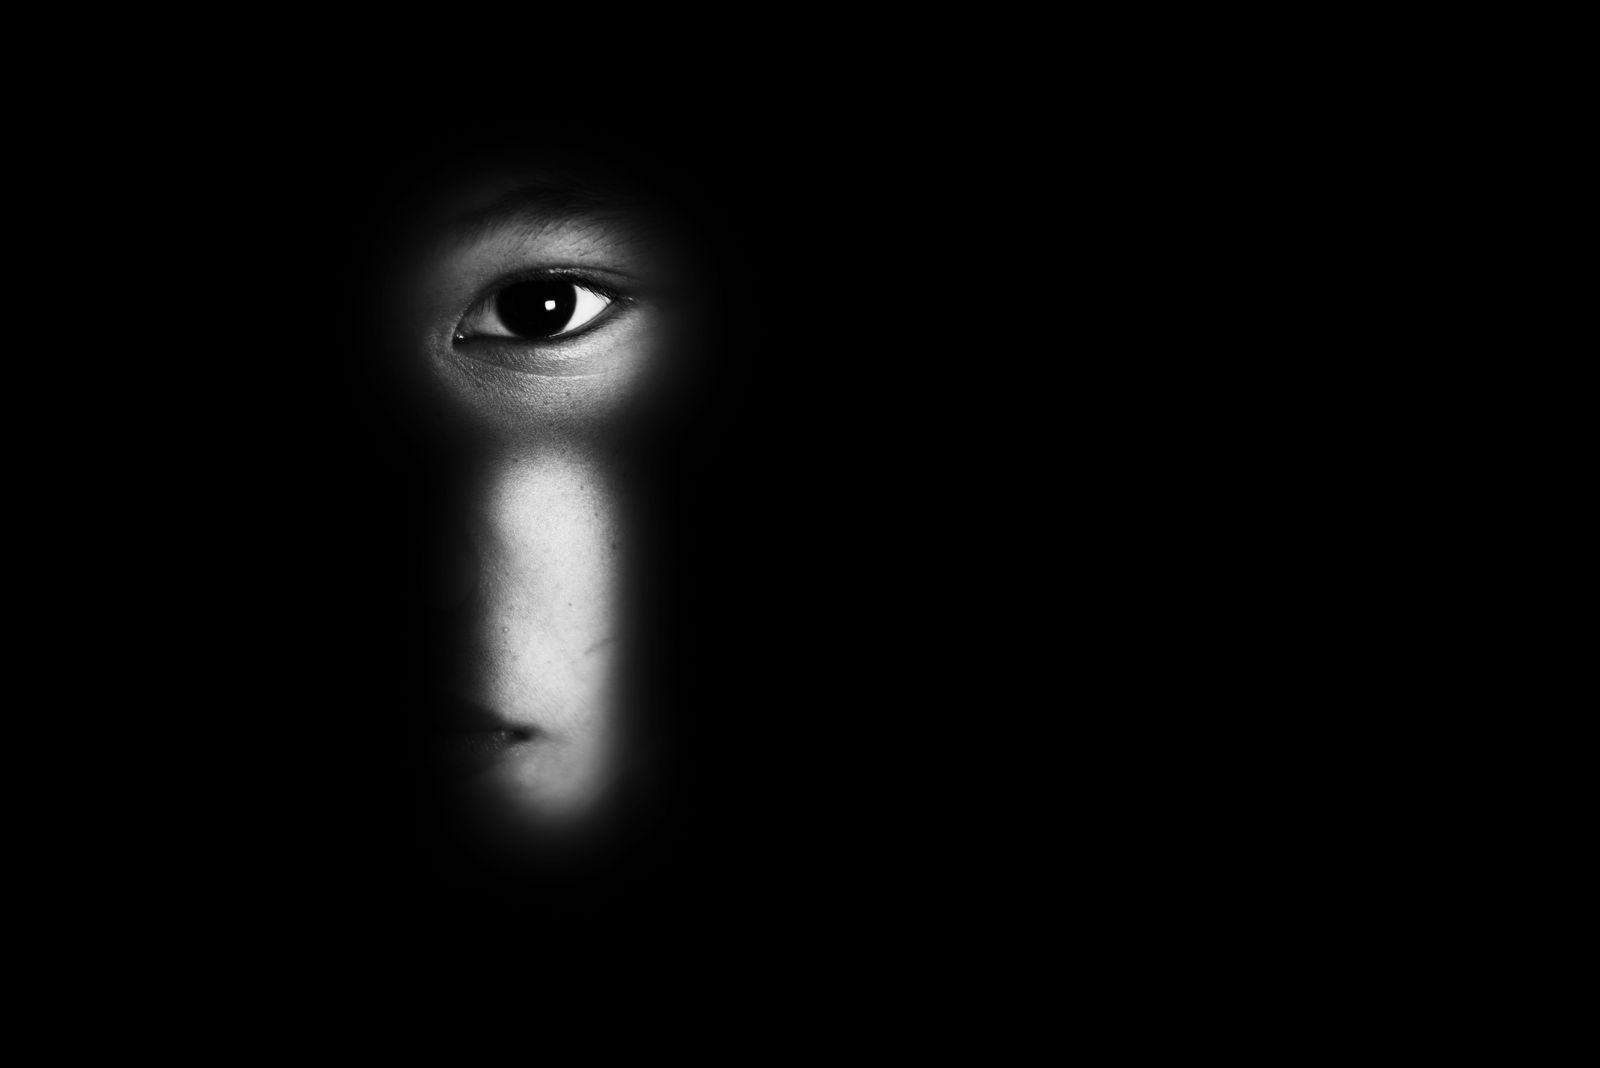 EINMALIGE VERWENDUNG eye of boy through key whole, child abuse concept EXPIRE 14.10.2024